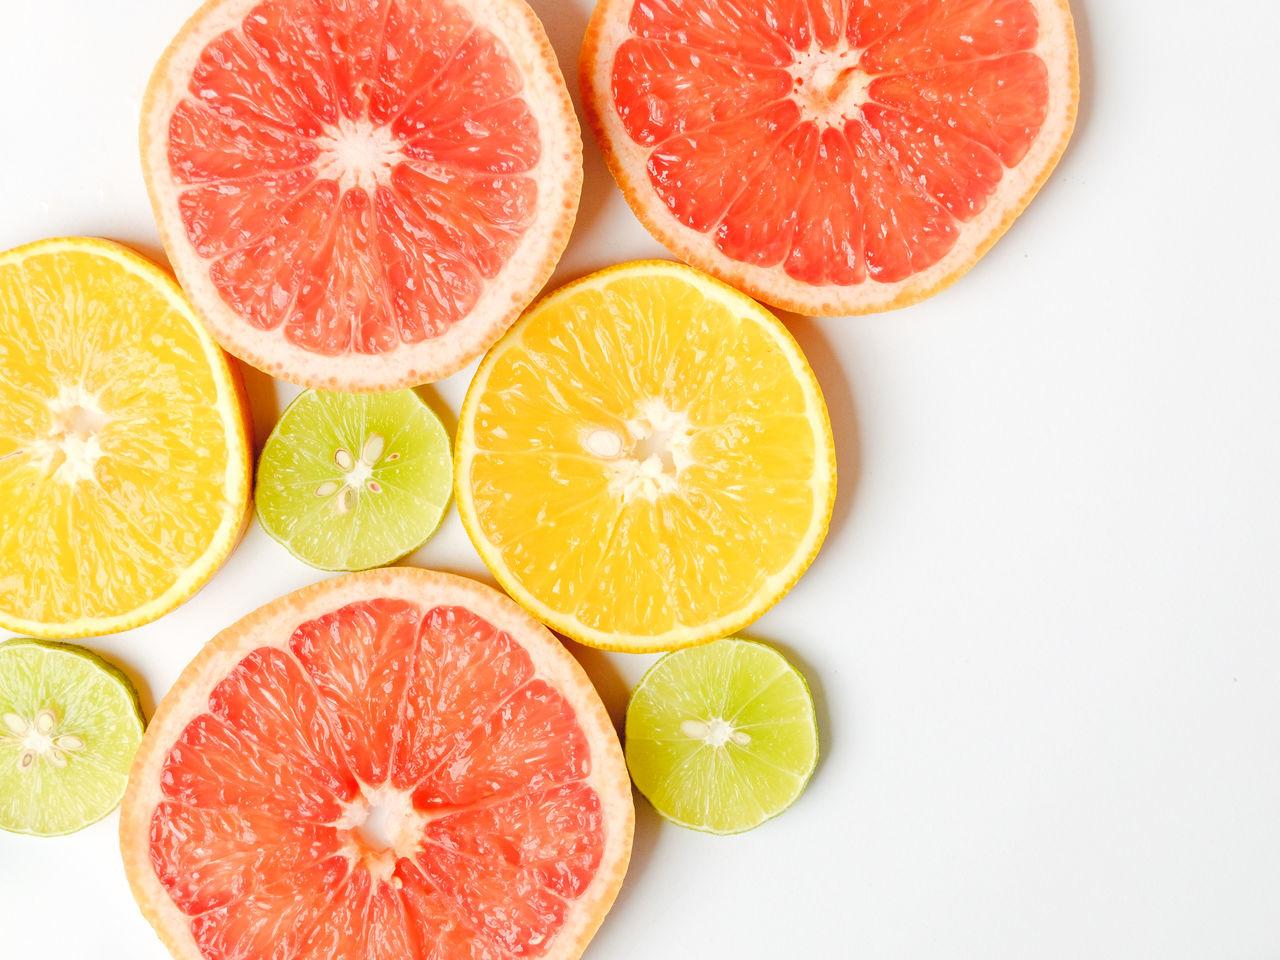 Blood Orange Citrus Fruit Cross Section Food Food And Drink Freshness Fruit Grapefruit Healthy Eating High Angle View Large Group Of Objects Lemons Lime Orange Fruit SLICE Sour Taste Studio Shot White Background